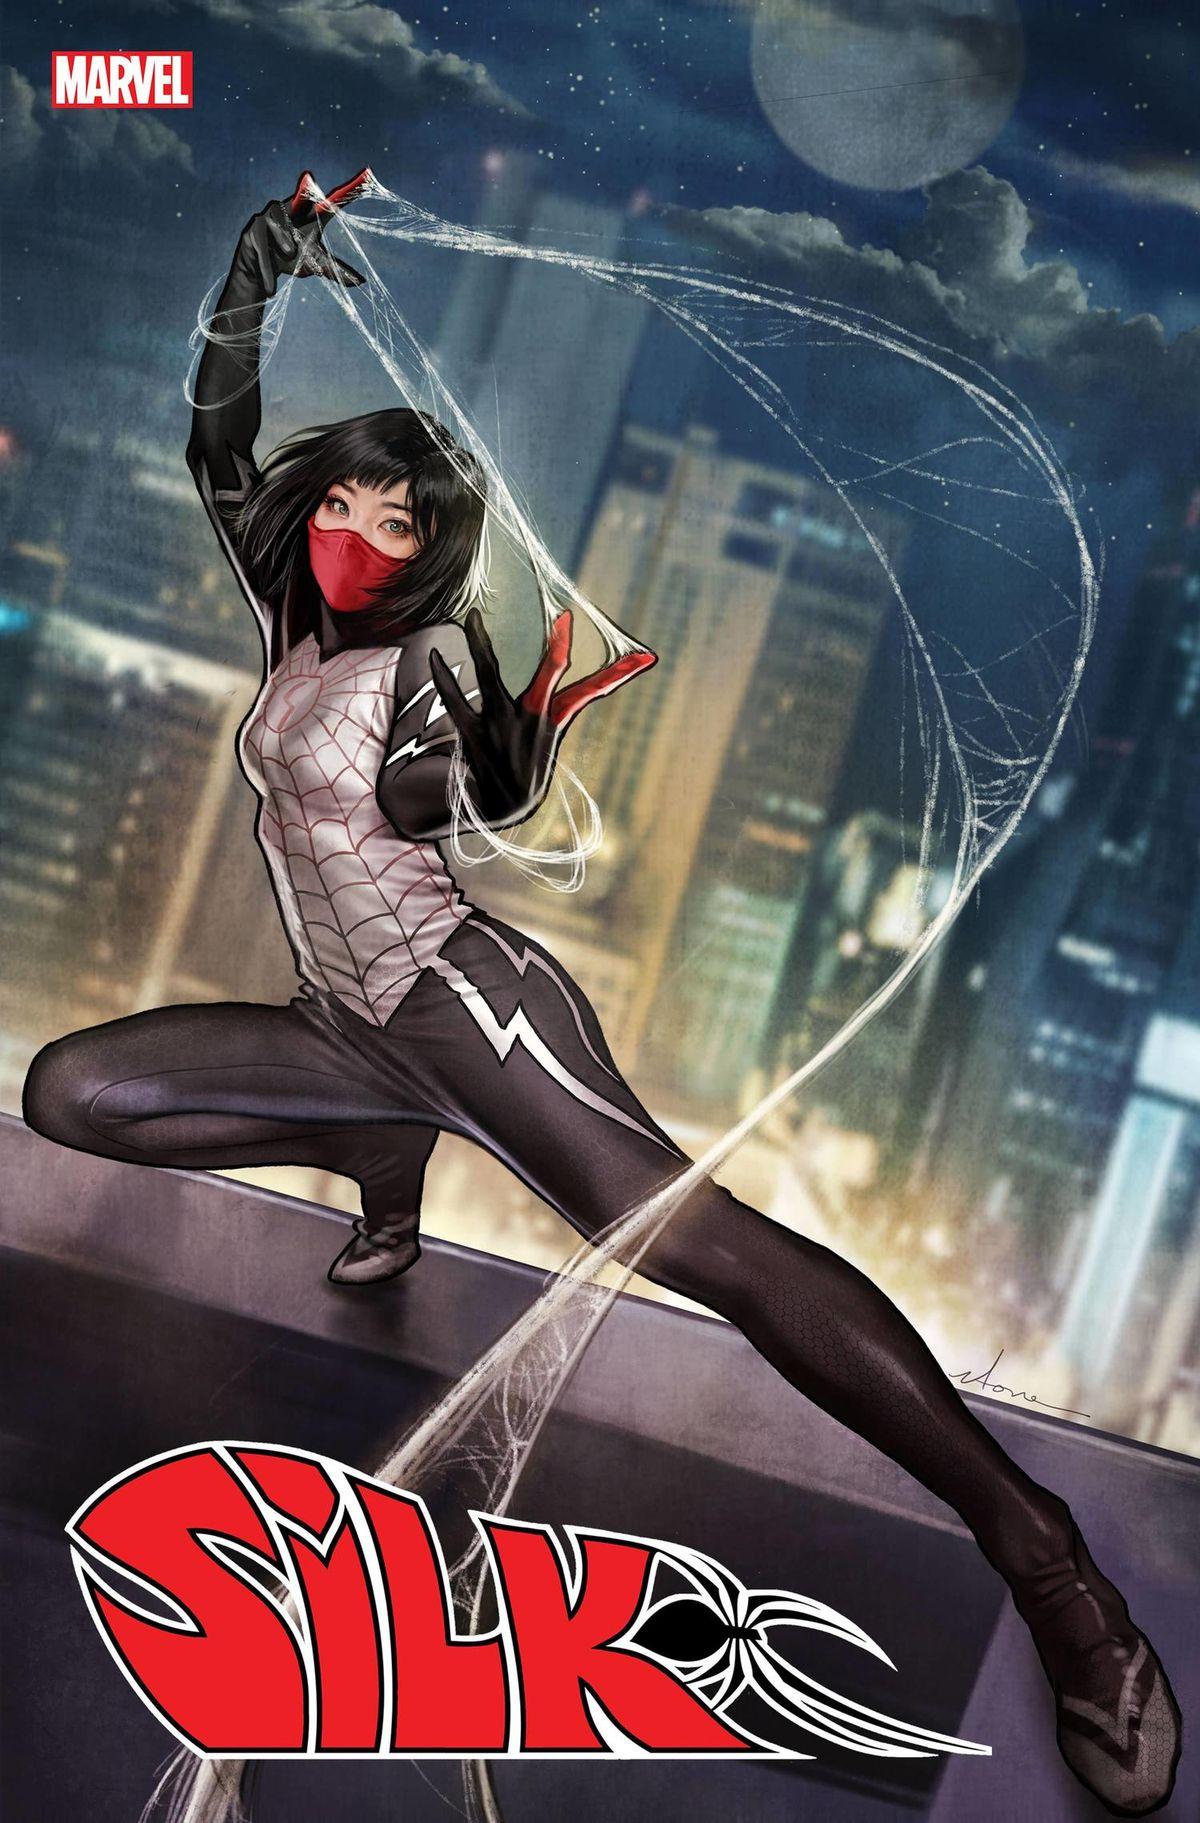 Cindy Moon Returns in 'Silk' #1